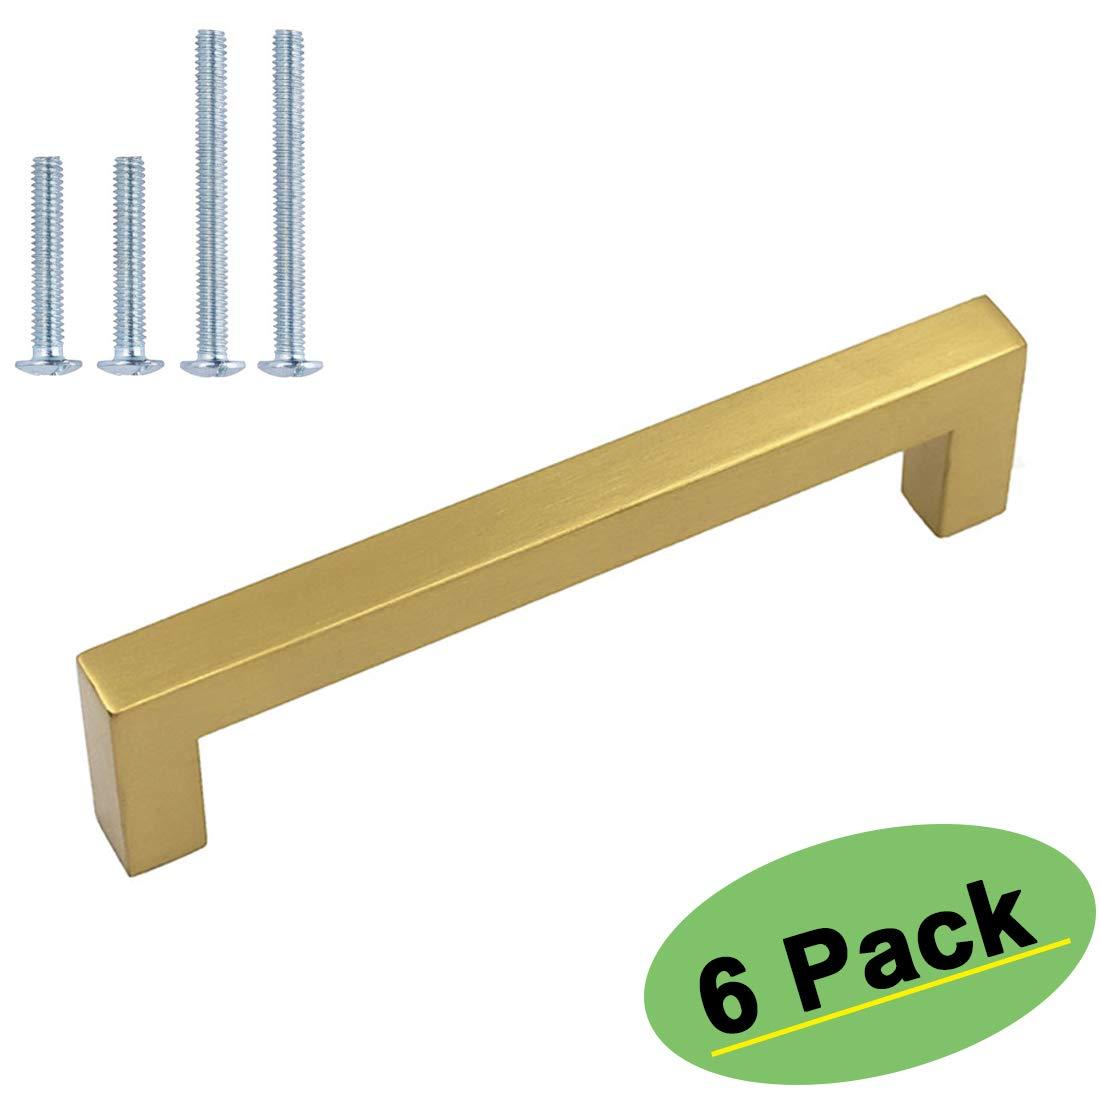 5 inch Cabinet Pulls Gold Cabinet Handles 6 Pack - homdiy HDJ12GD Gold Cabinet Hardware Pulls Bathroom Cabinet Pulls Gold Kitchen Drawer Pulls for Closet, Wardrobe